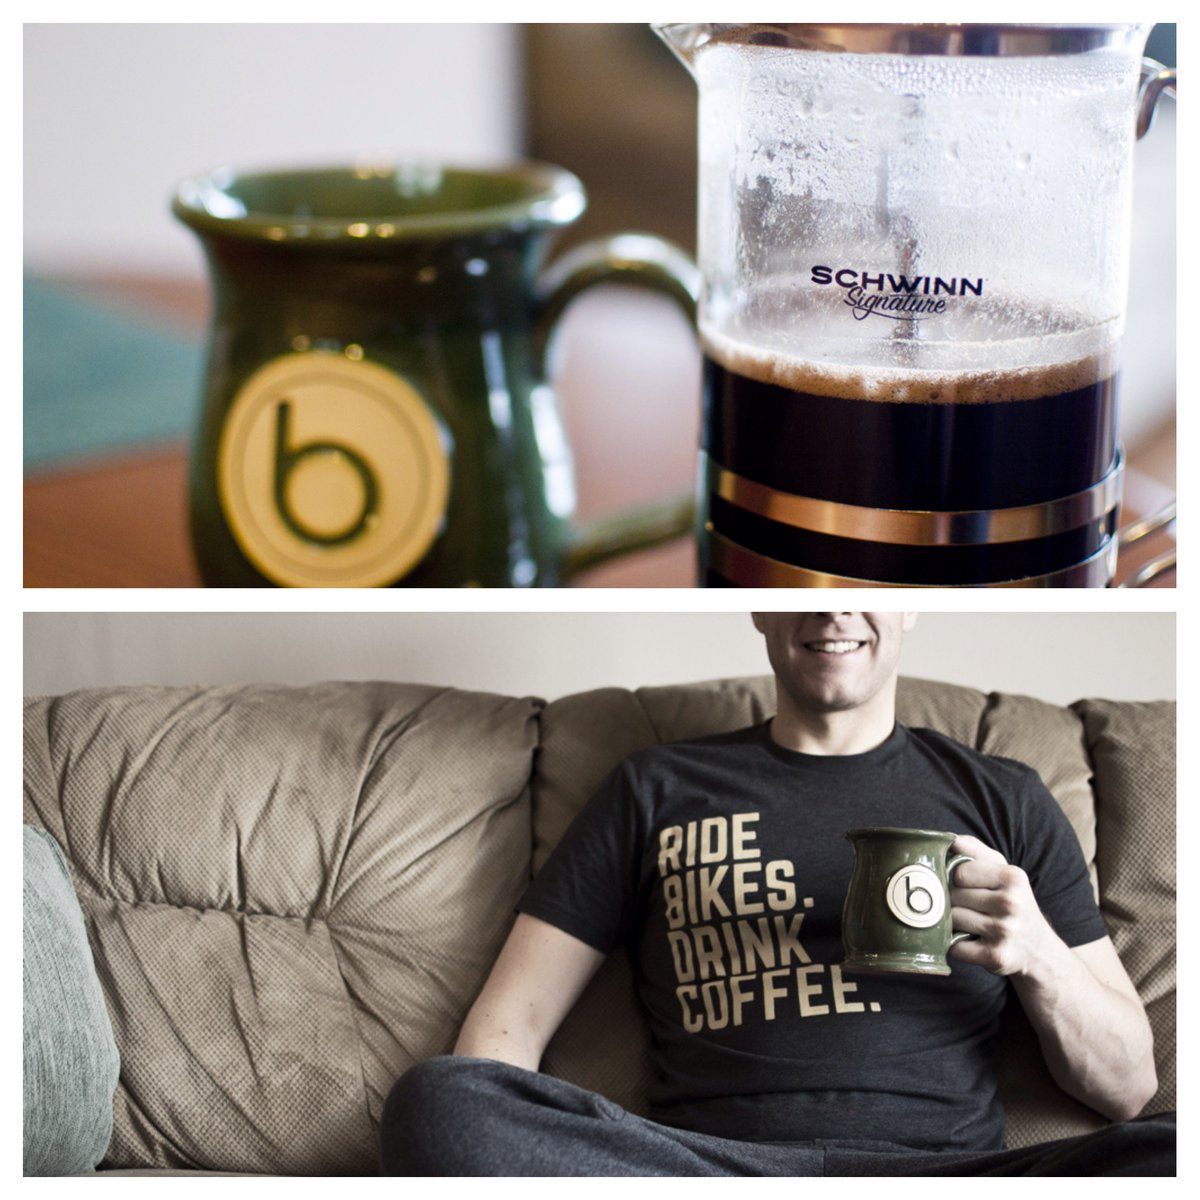 Love Schwinn? Love Coffee? Follow us to enter to win this Schwinn coffee press and Schwinn T-shirt.  Ends June 1st. https://t.co/cBPpi9L4sF